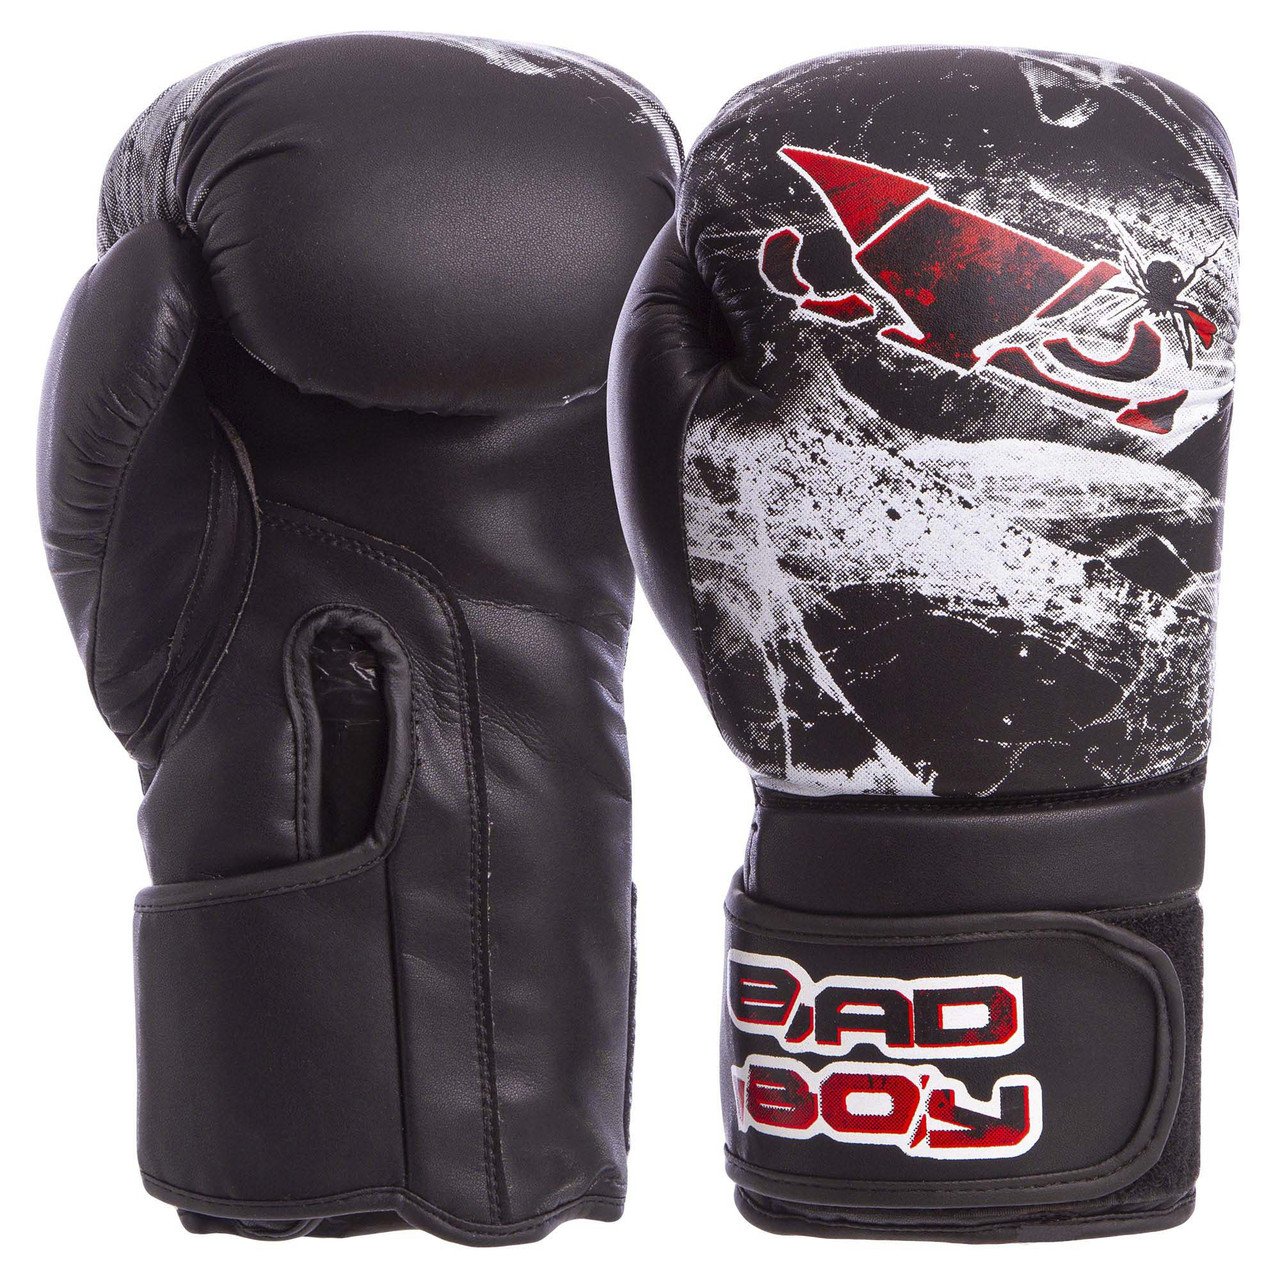 Перчатки боксерские FLEX на липучке BAD BOY SPIDER 10 унций VL-6602